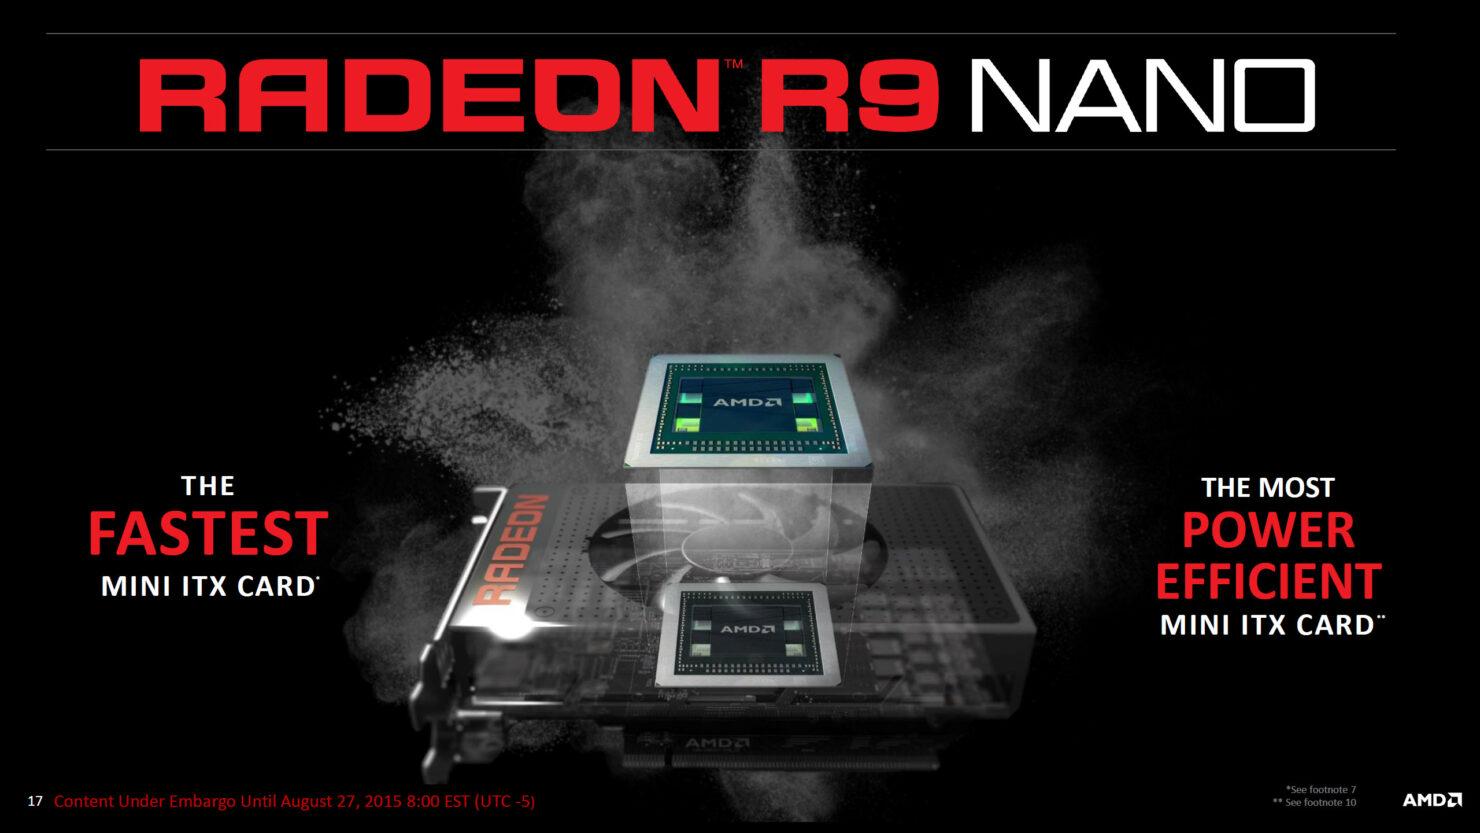 amd-radeon-r9-nano_mini-itx-graphics-card